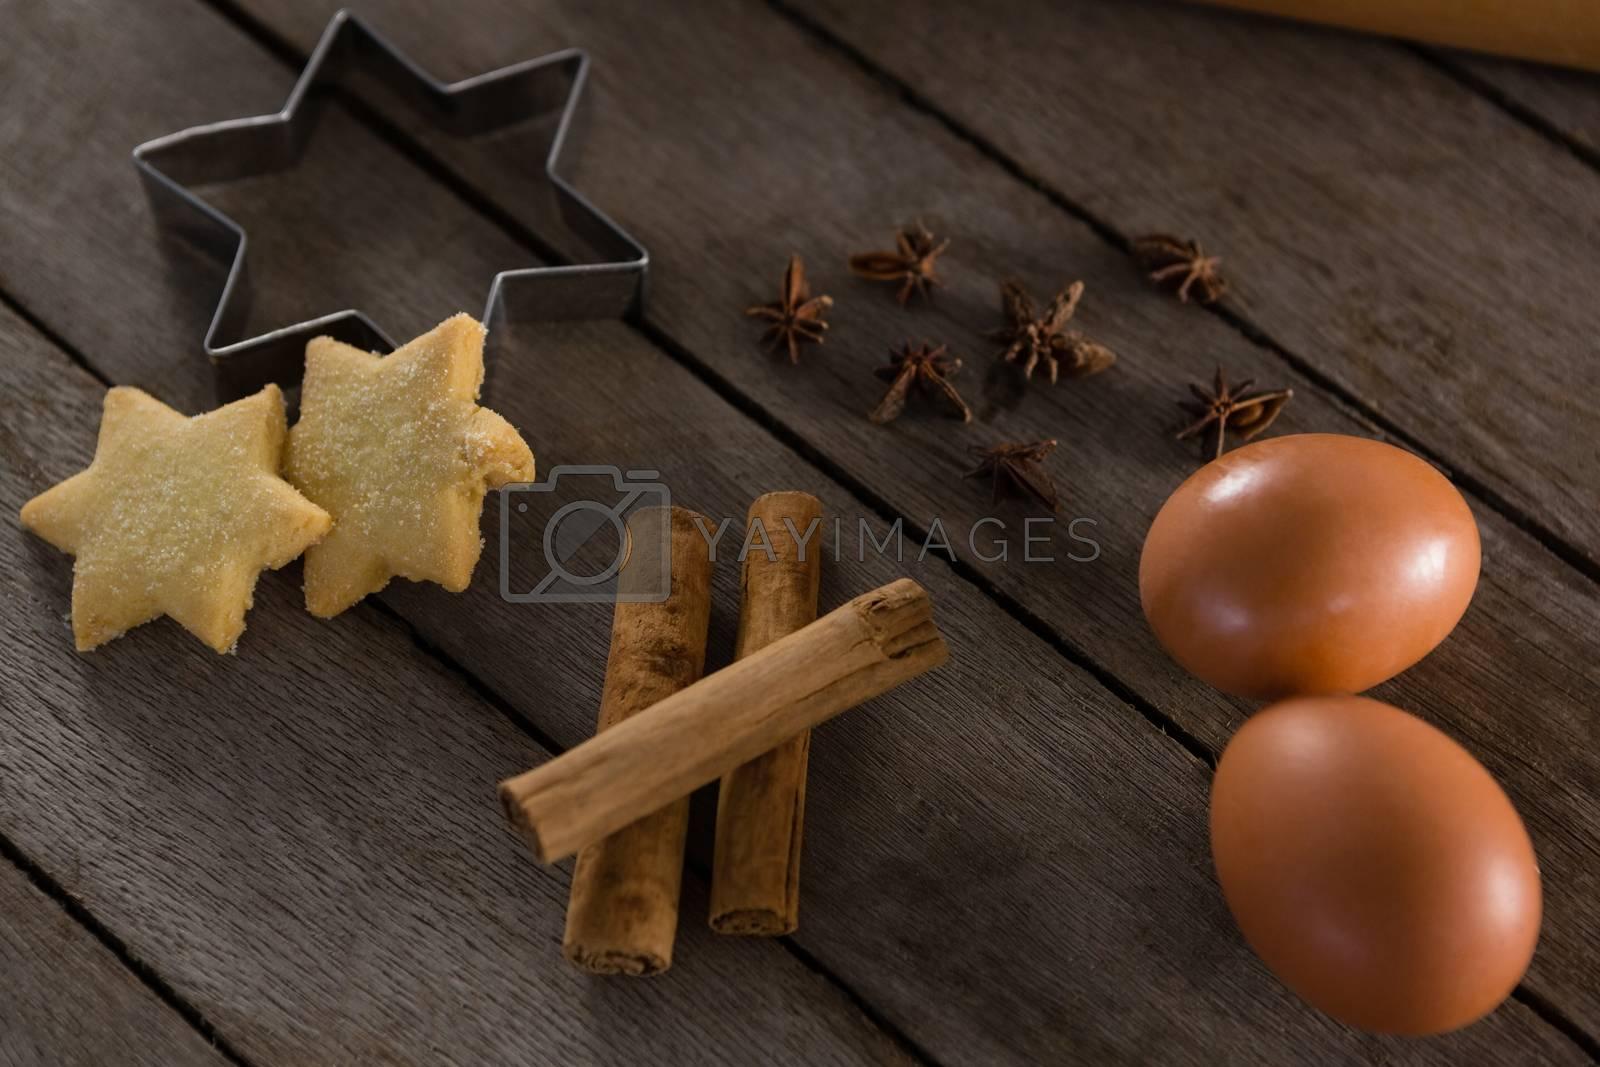 Eggs, cookie cutter, cookies, cinnamon and anise by Wavebreakmedia